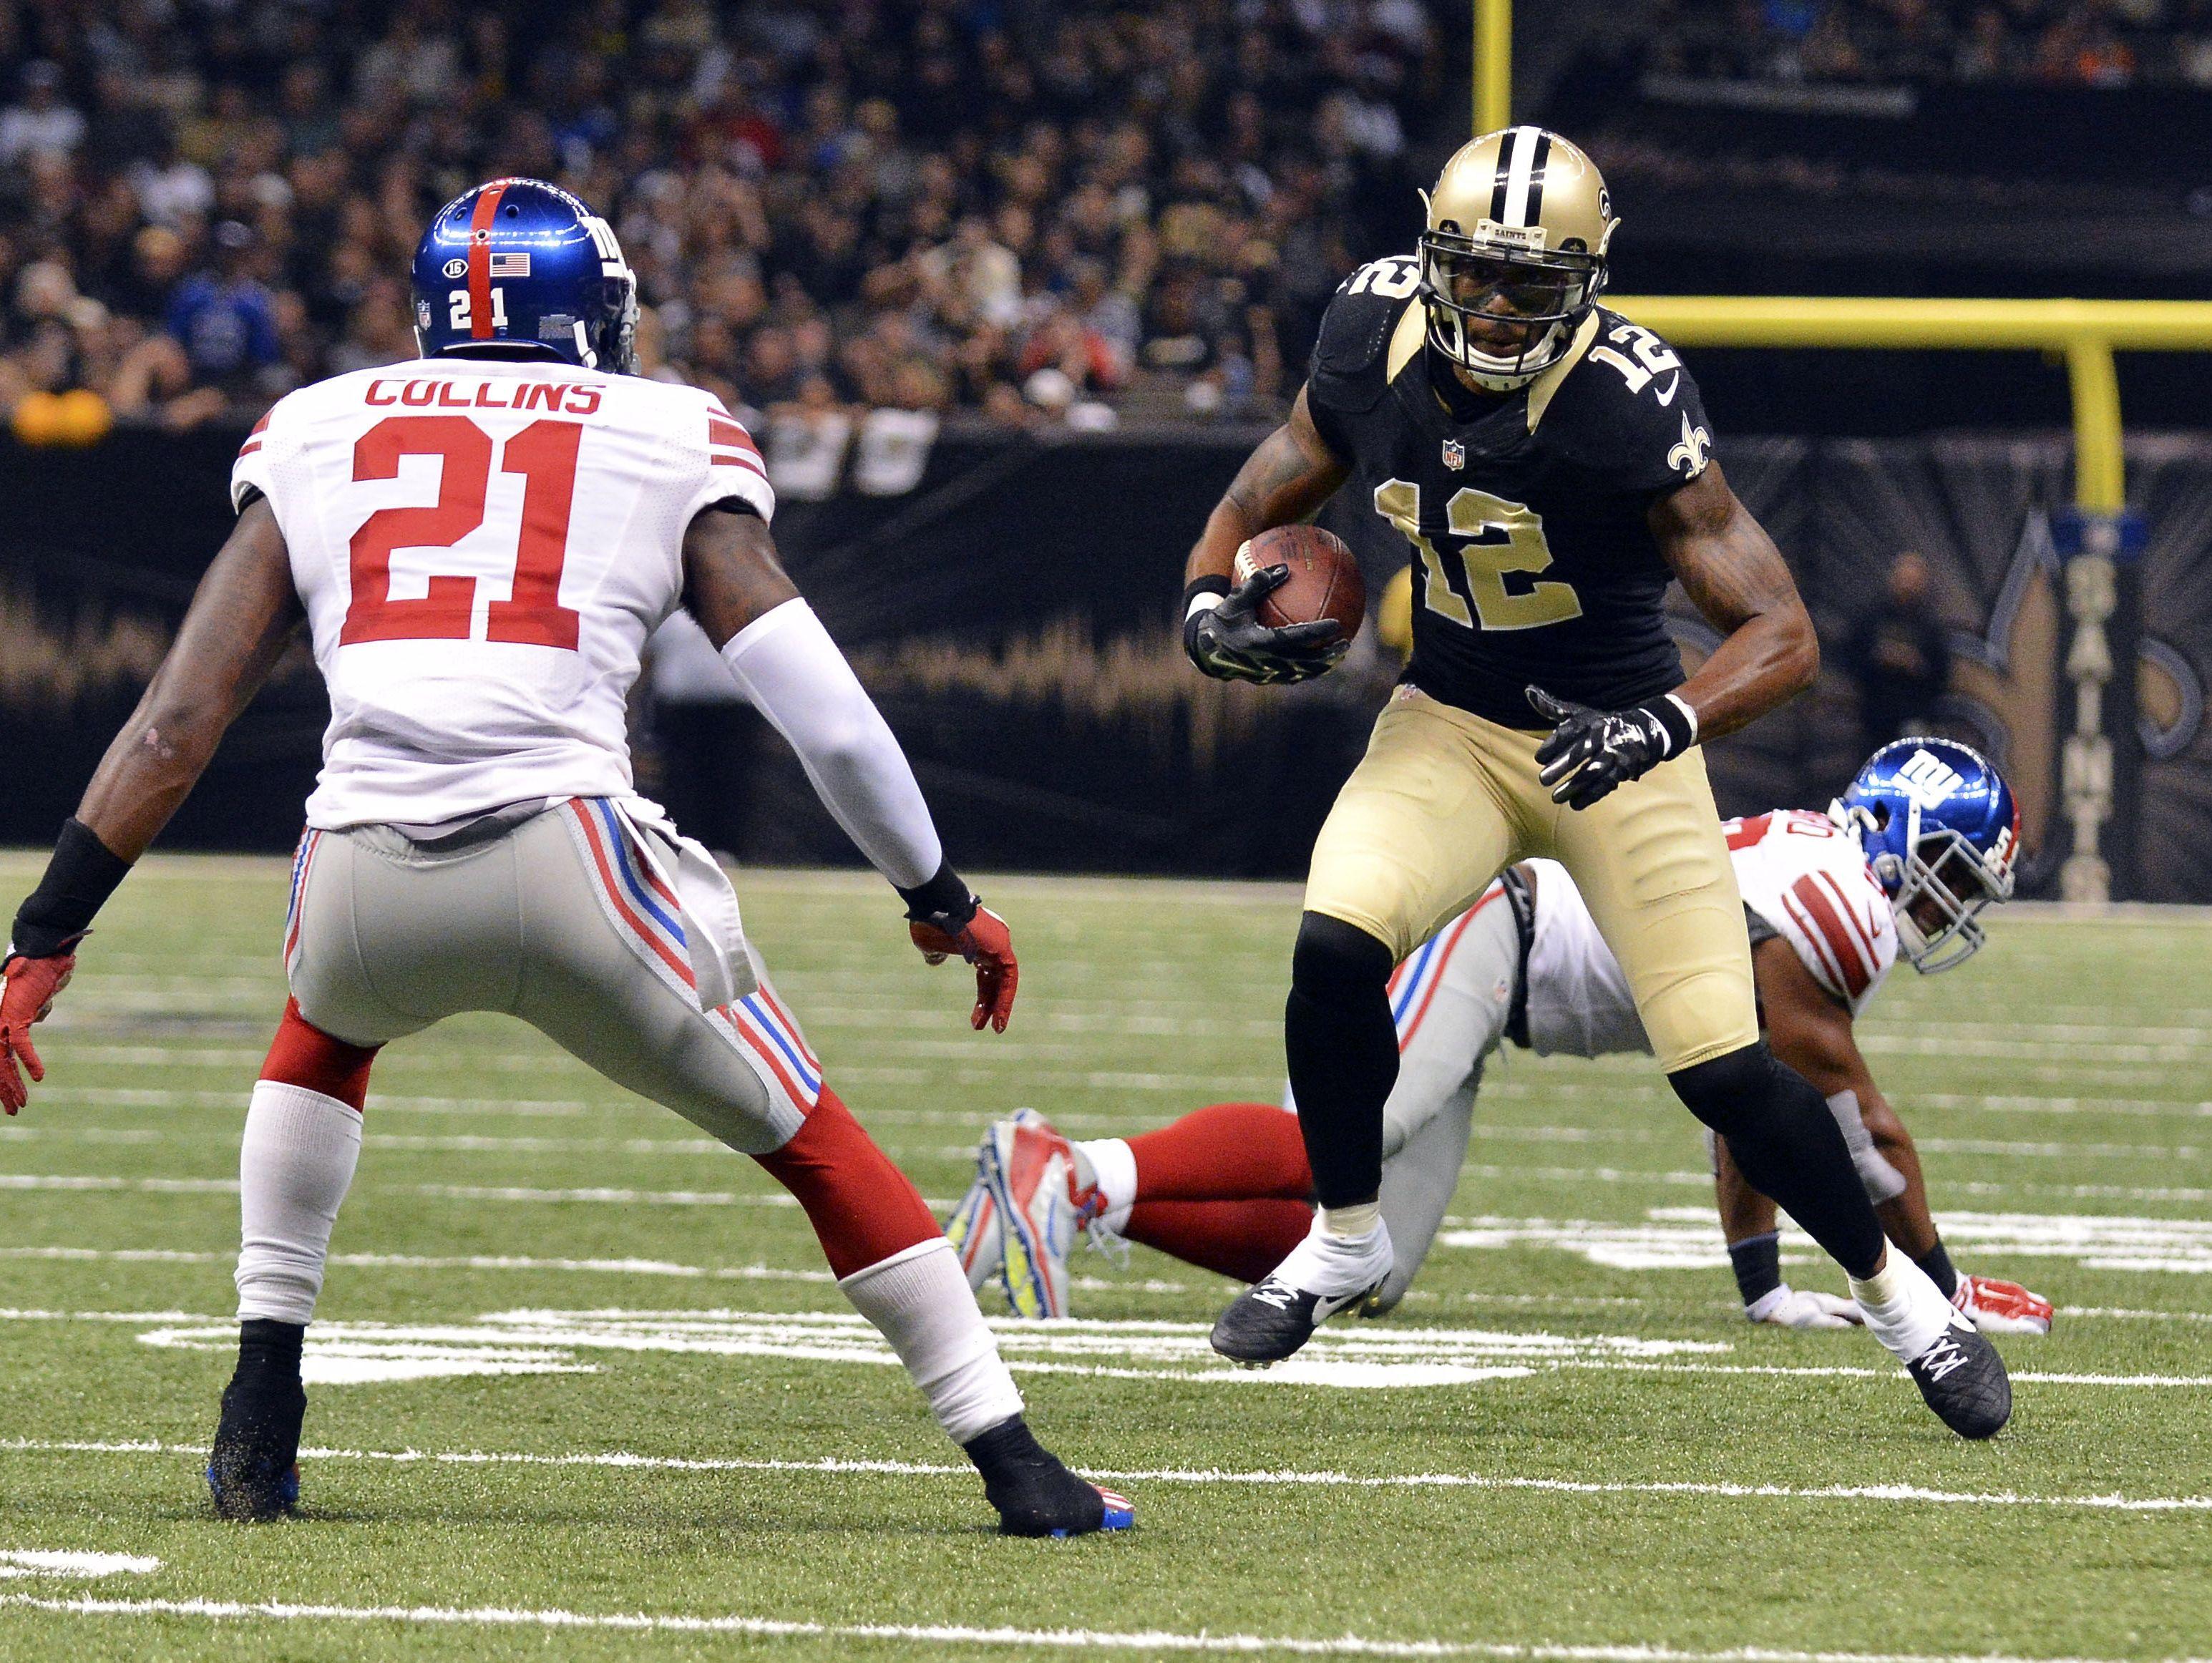 NFL: New York Giants at New Orleans Saints